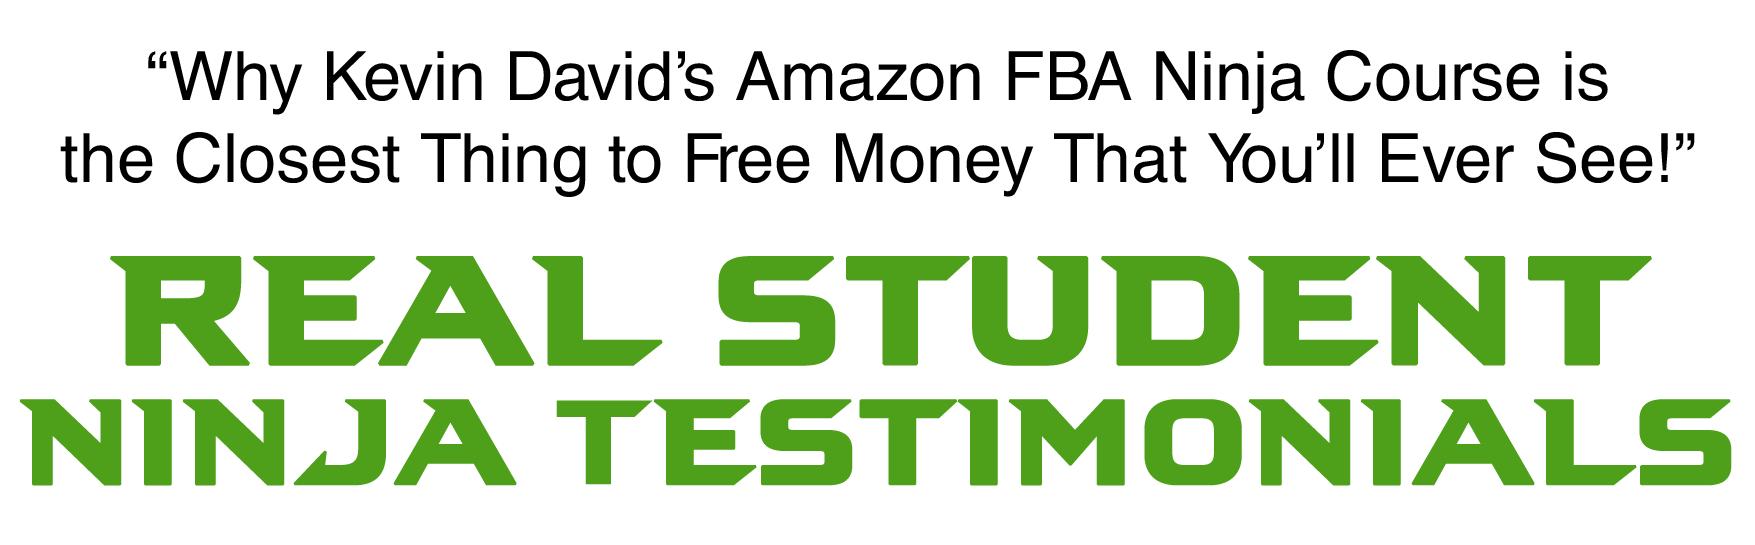 The Best Amazon FBA Course Online 12